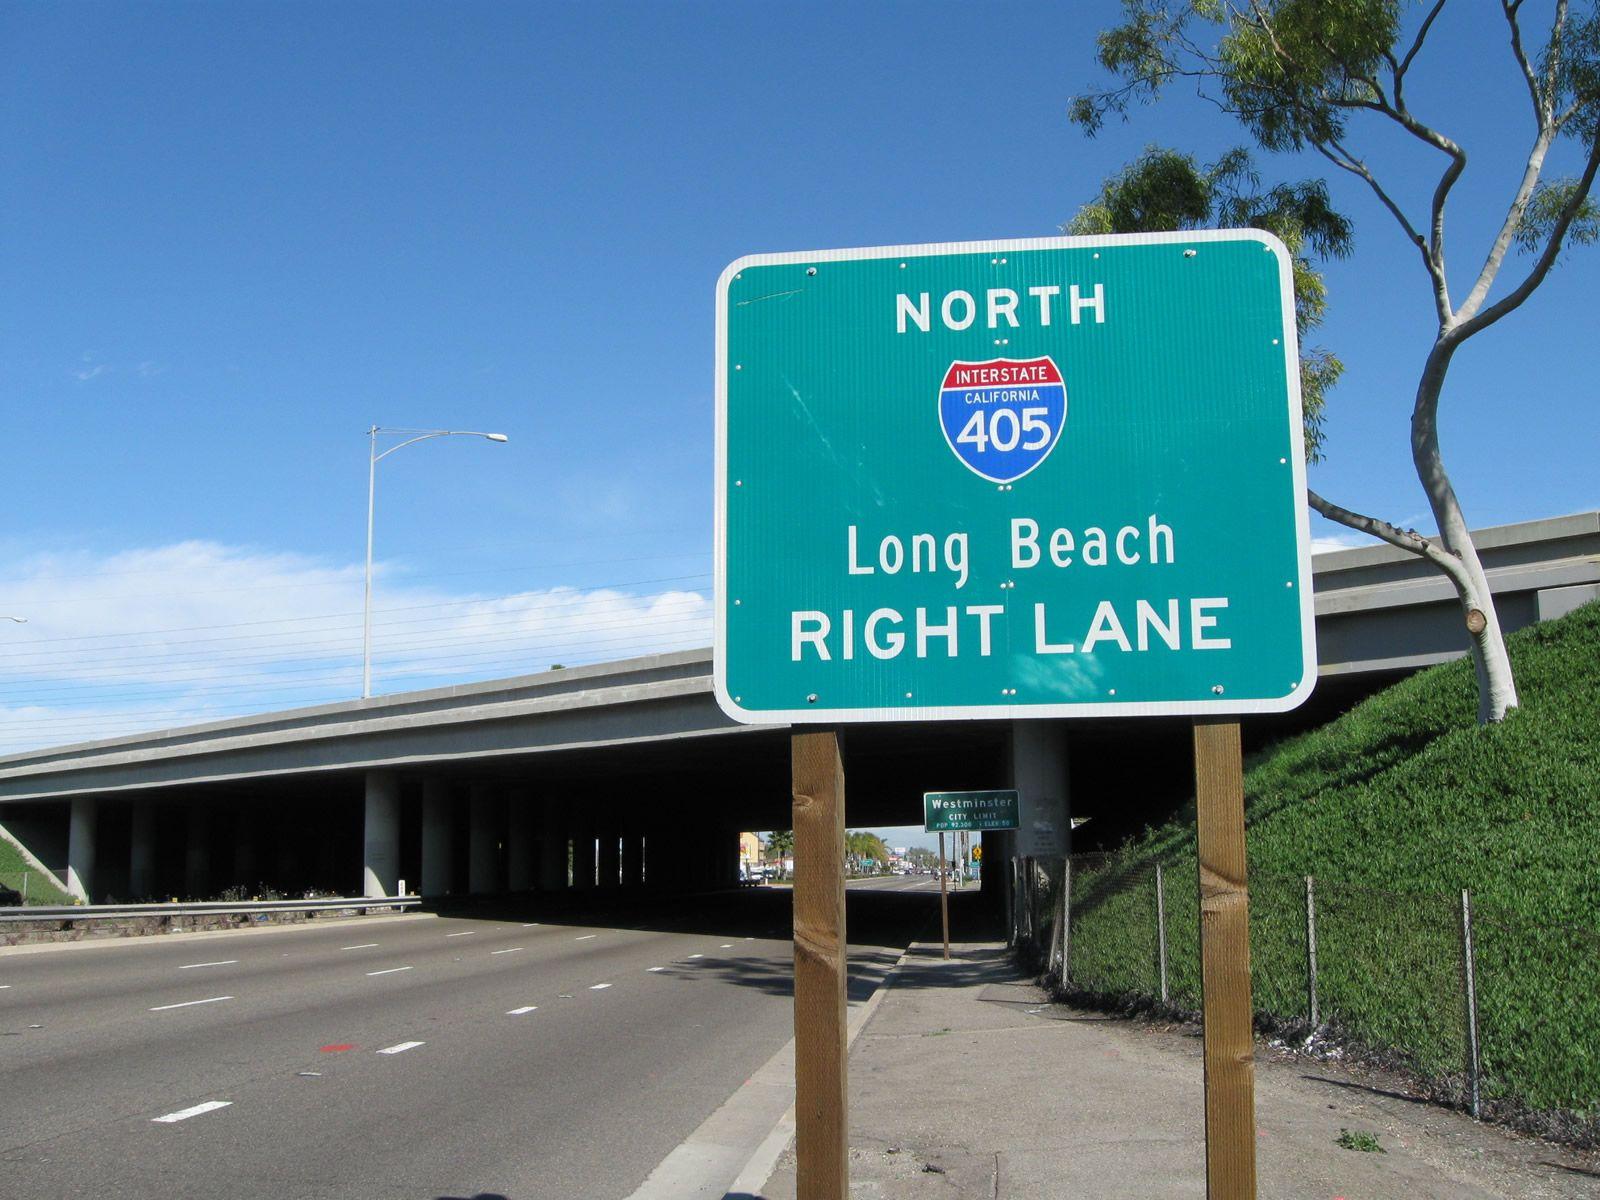 Beach Boulevard North With Interstate 405 Sango Freeway North West